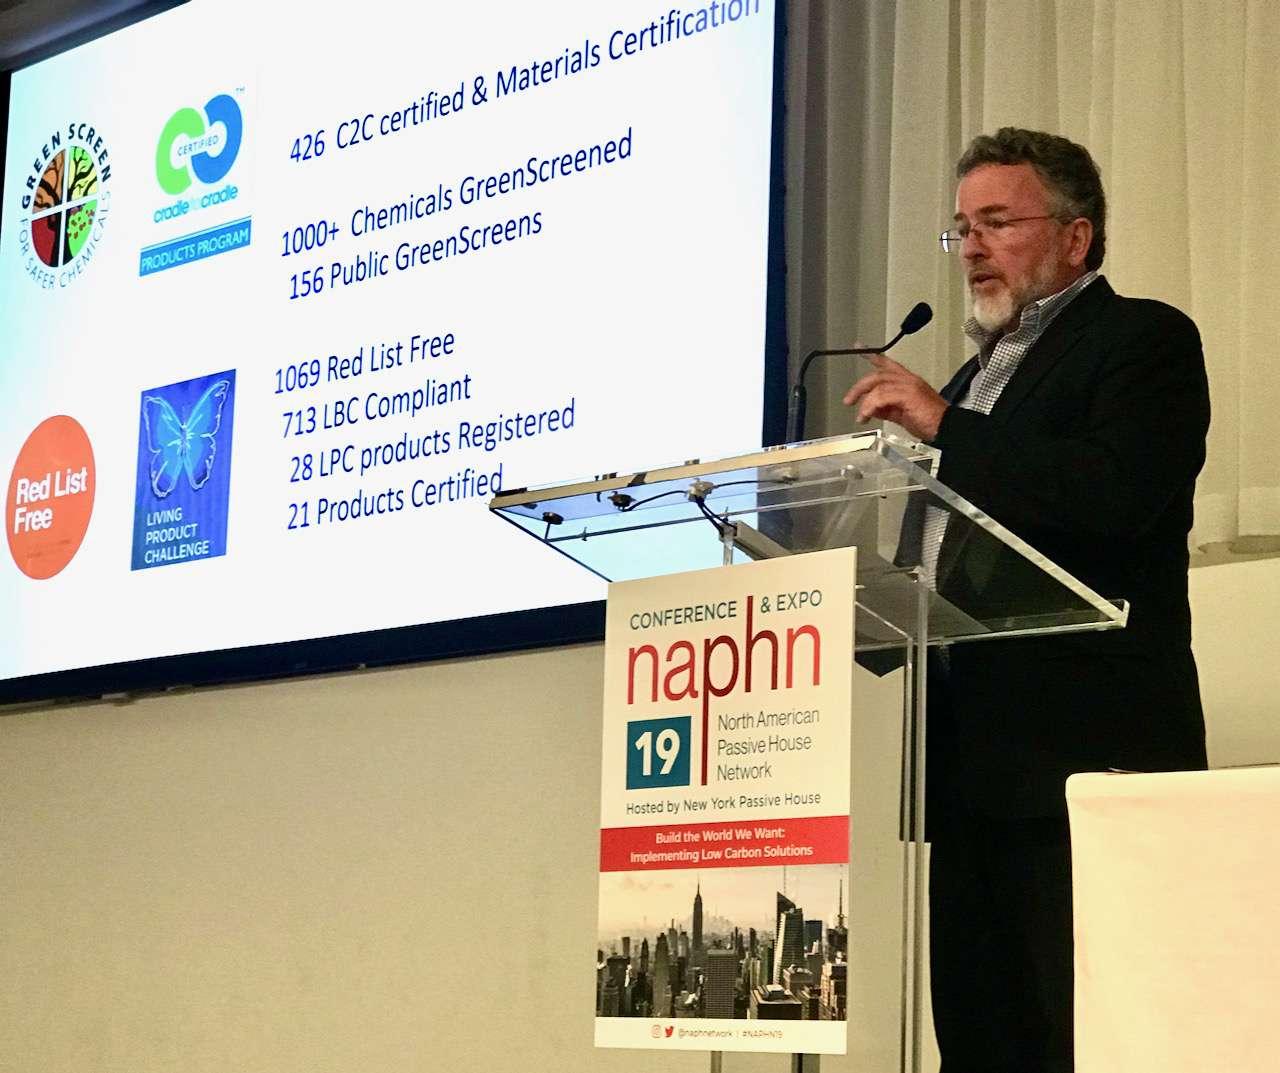 Bill Walsh speaking at NAHPN conference